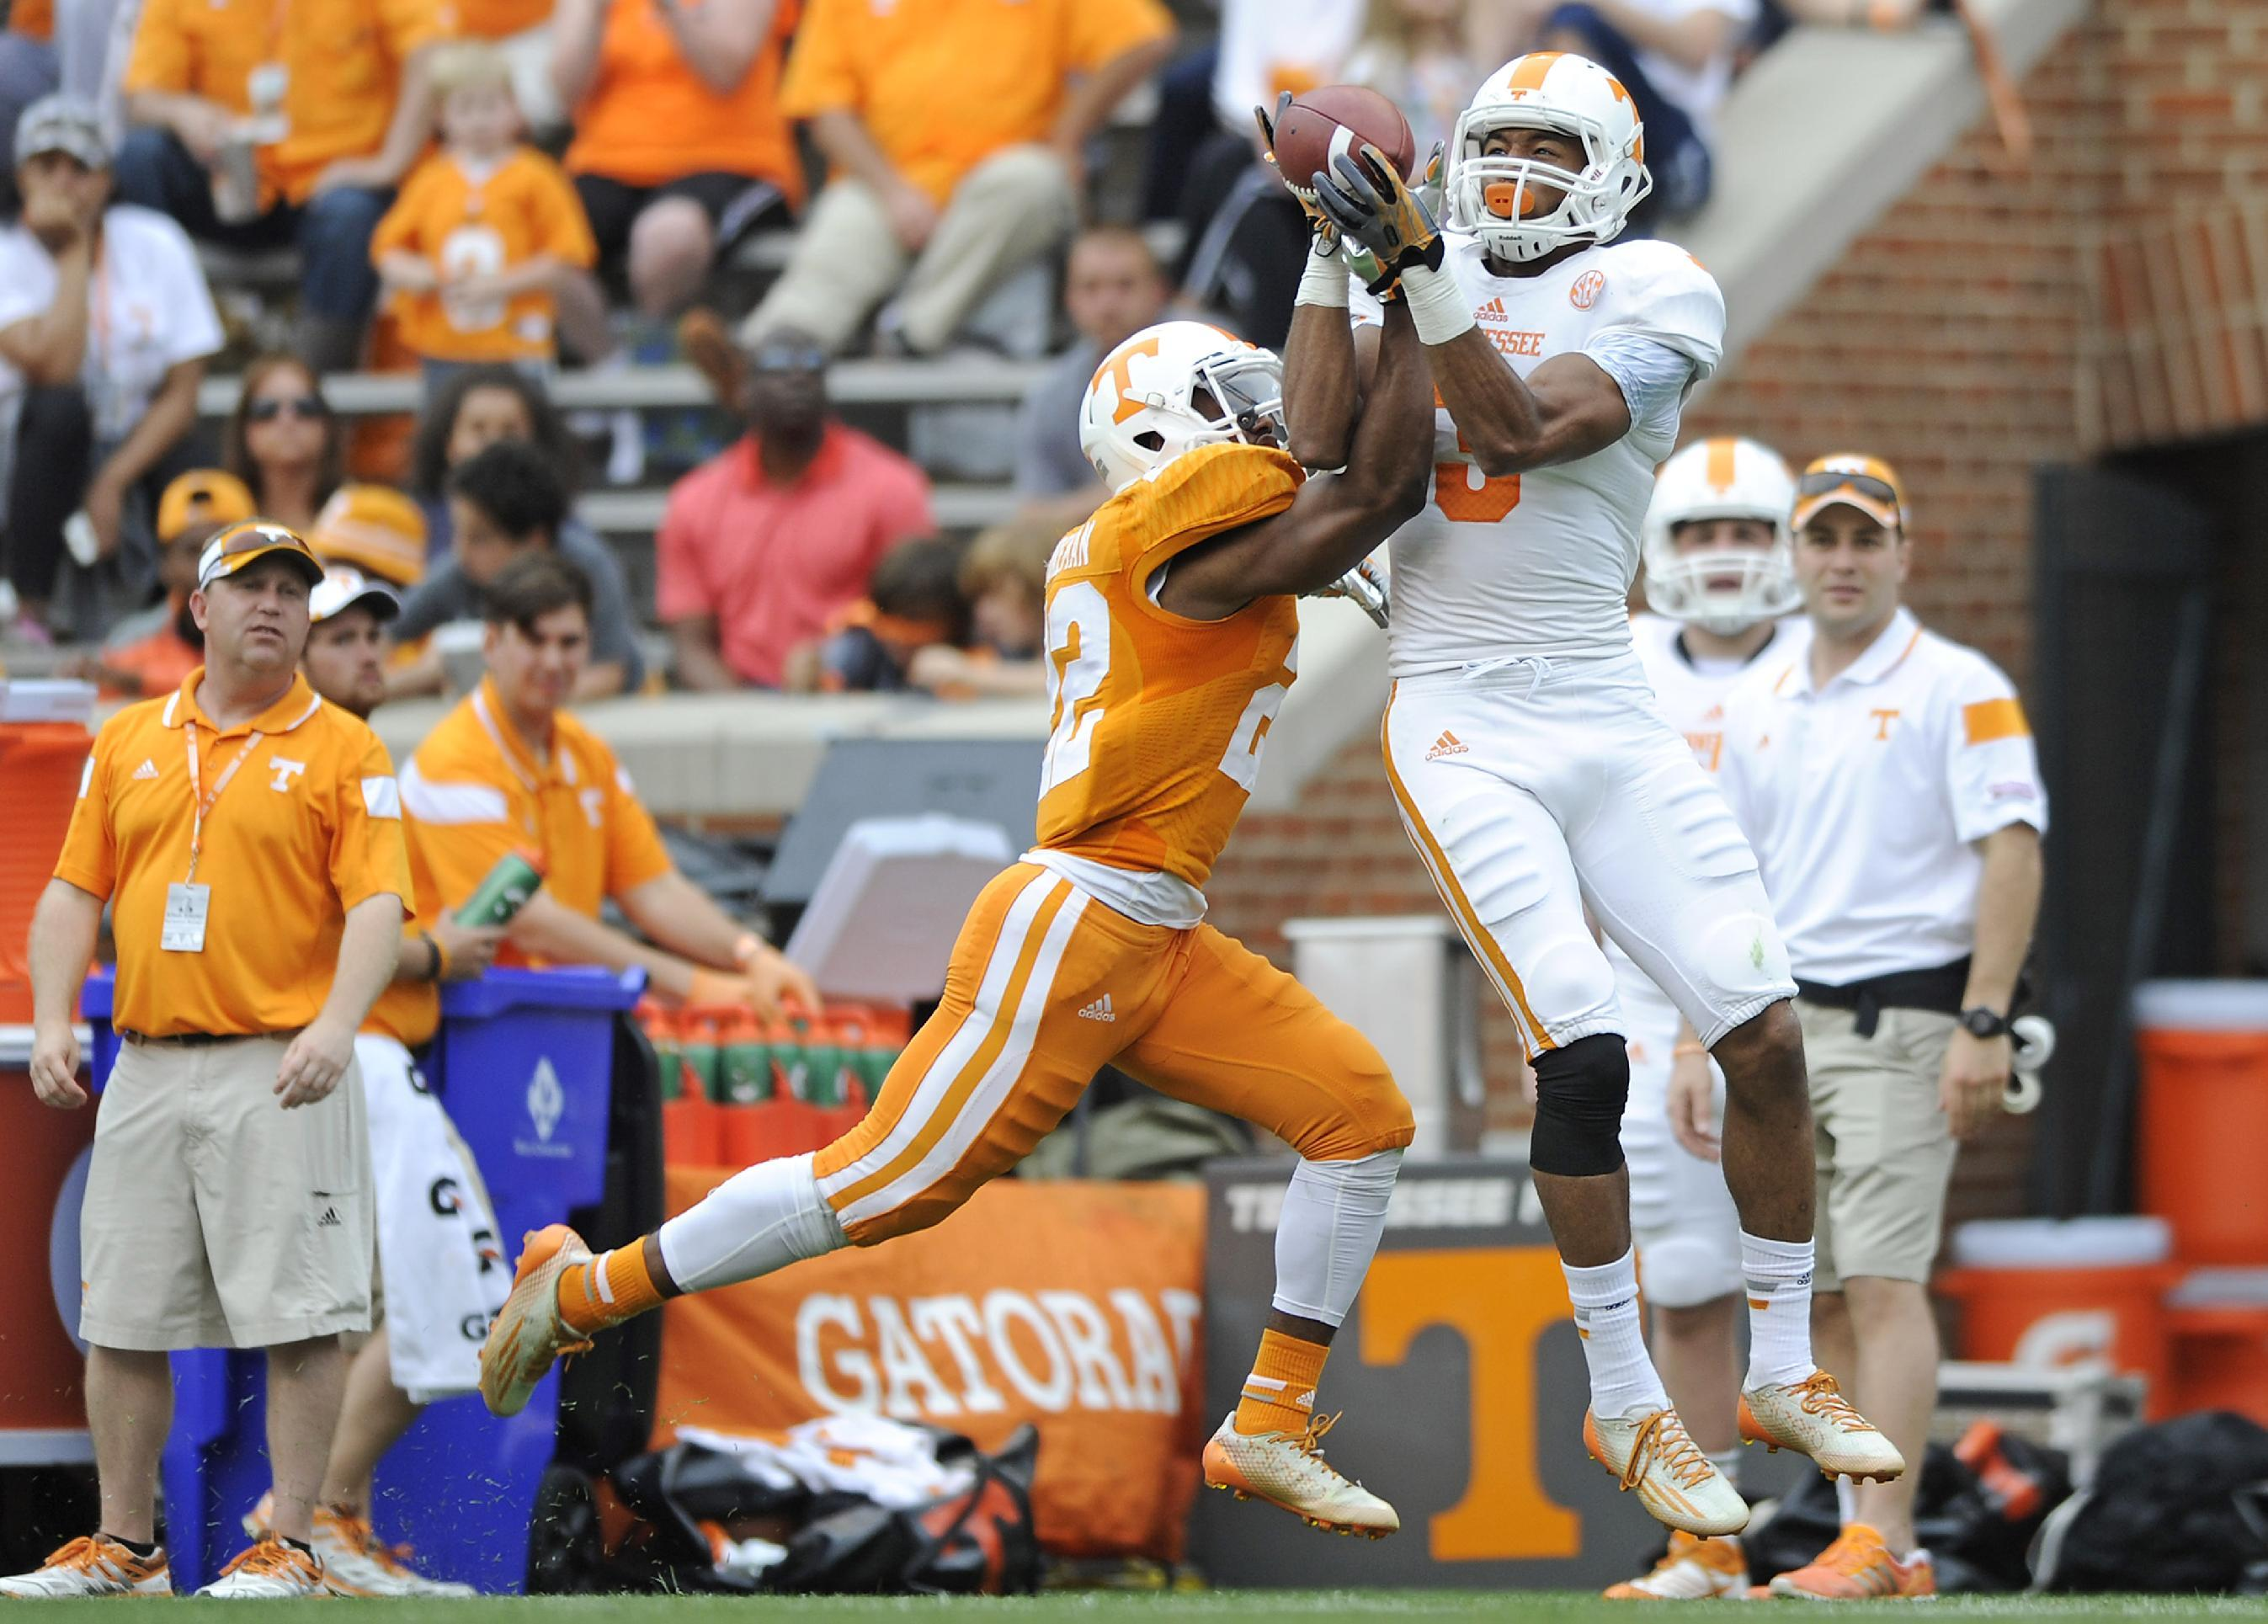 Sutton's defensive TD helps Orange win Vols' spring game